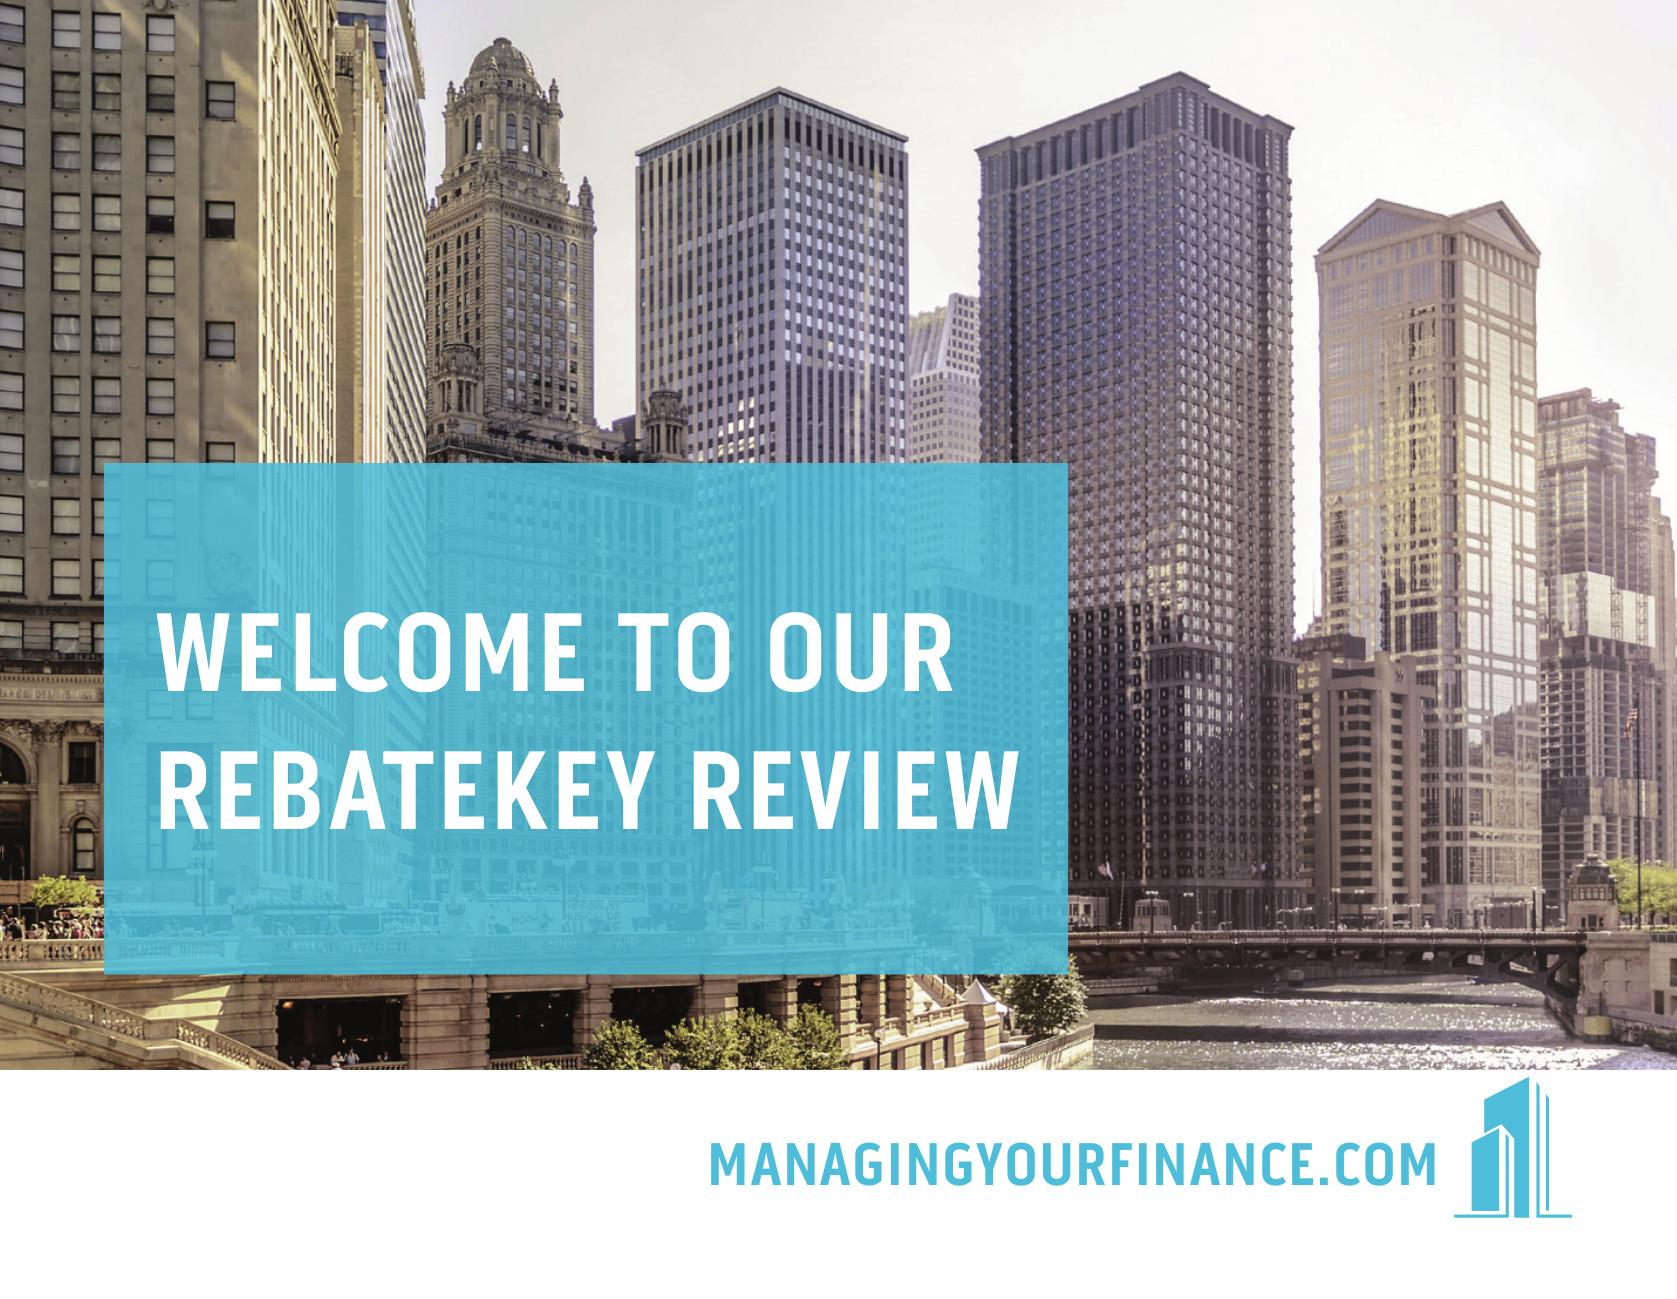 RebateKey Review Is RebateKey Legitimate or a Scam